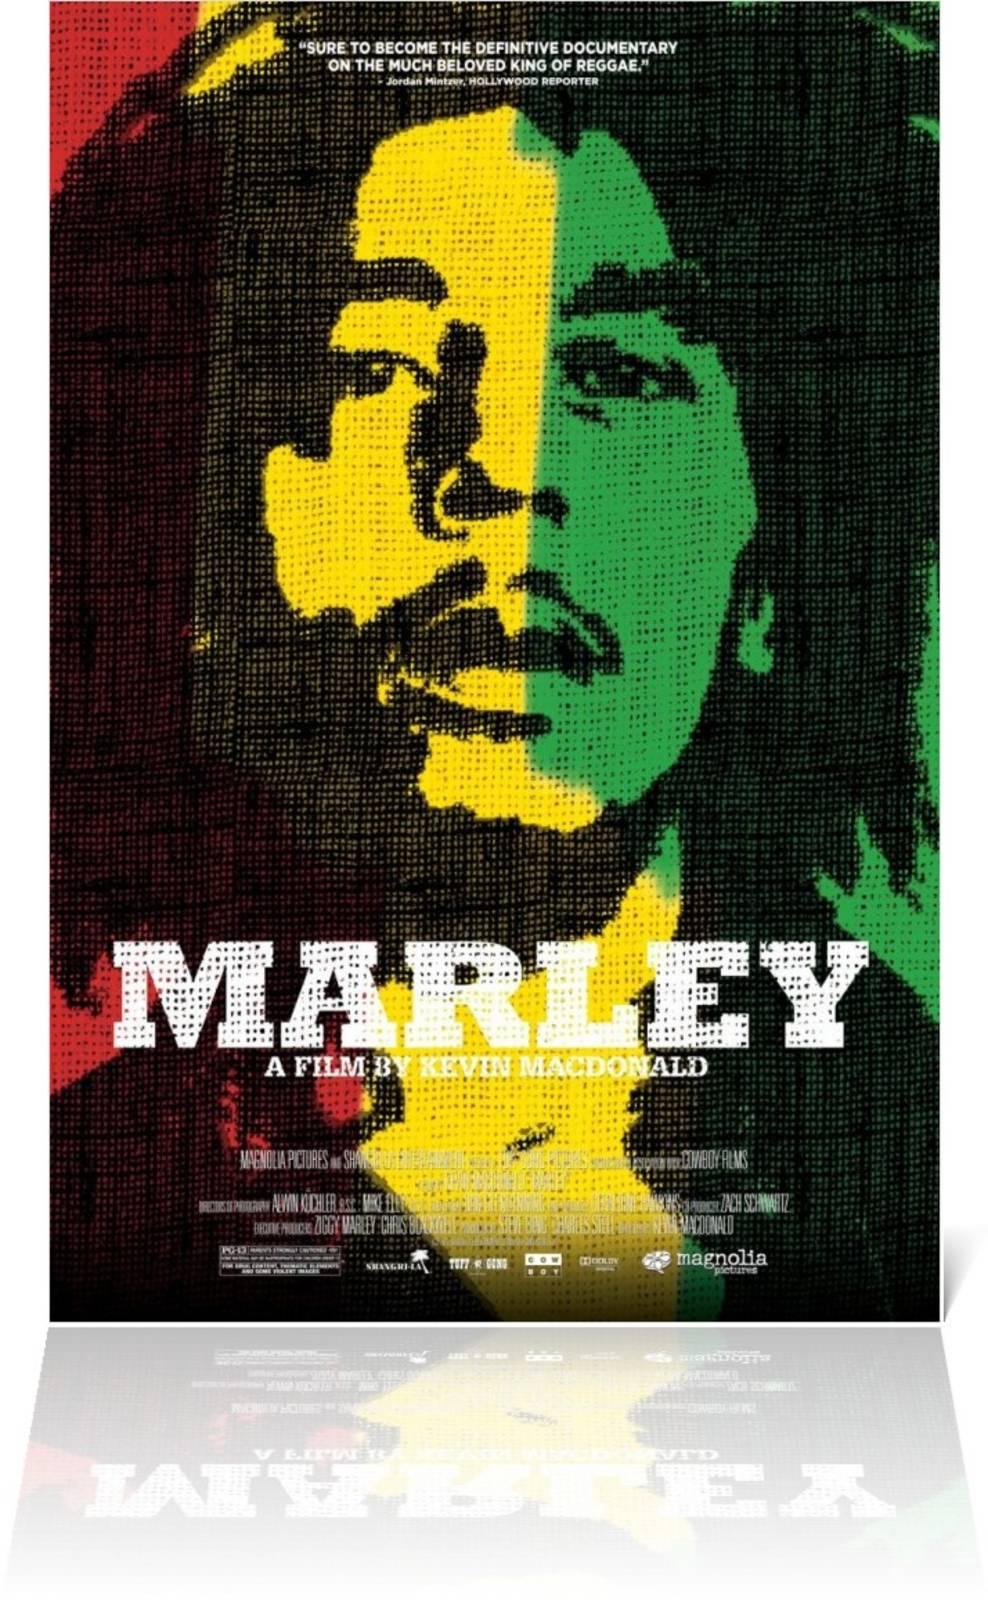 Film Marley - Cineman